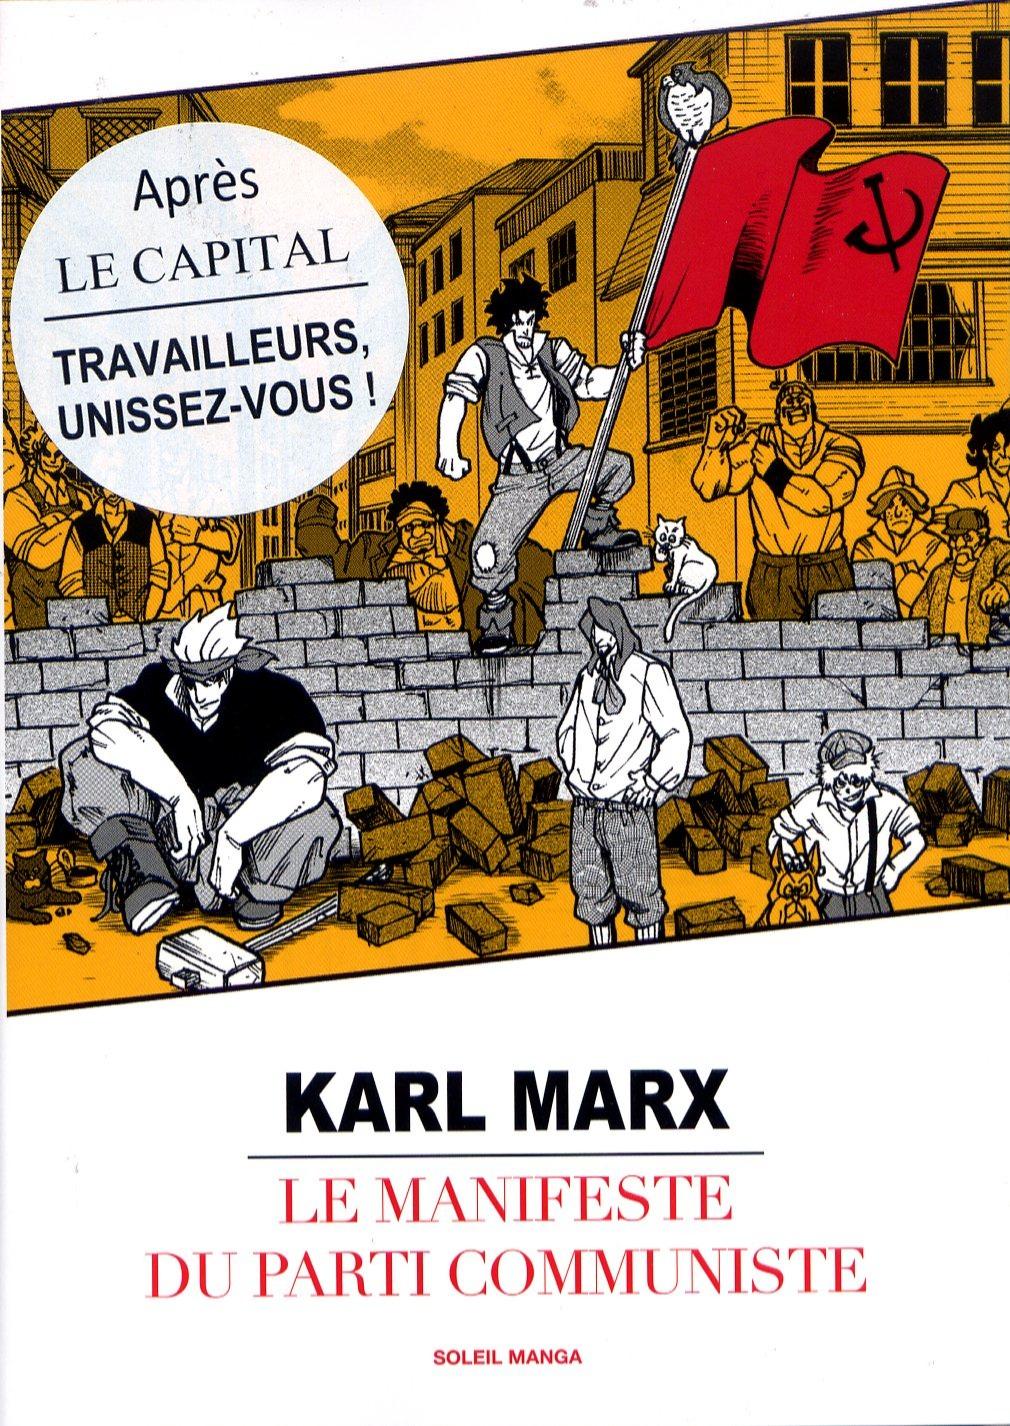 Le Manifeste du Parti Communiste Manga